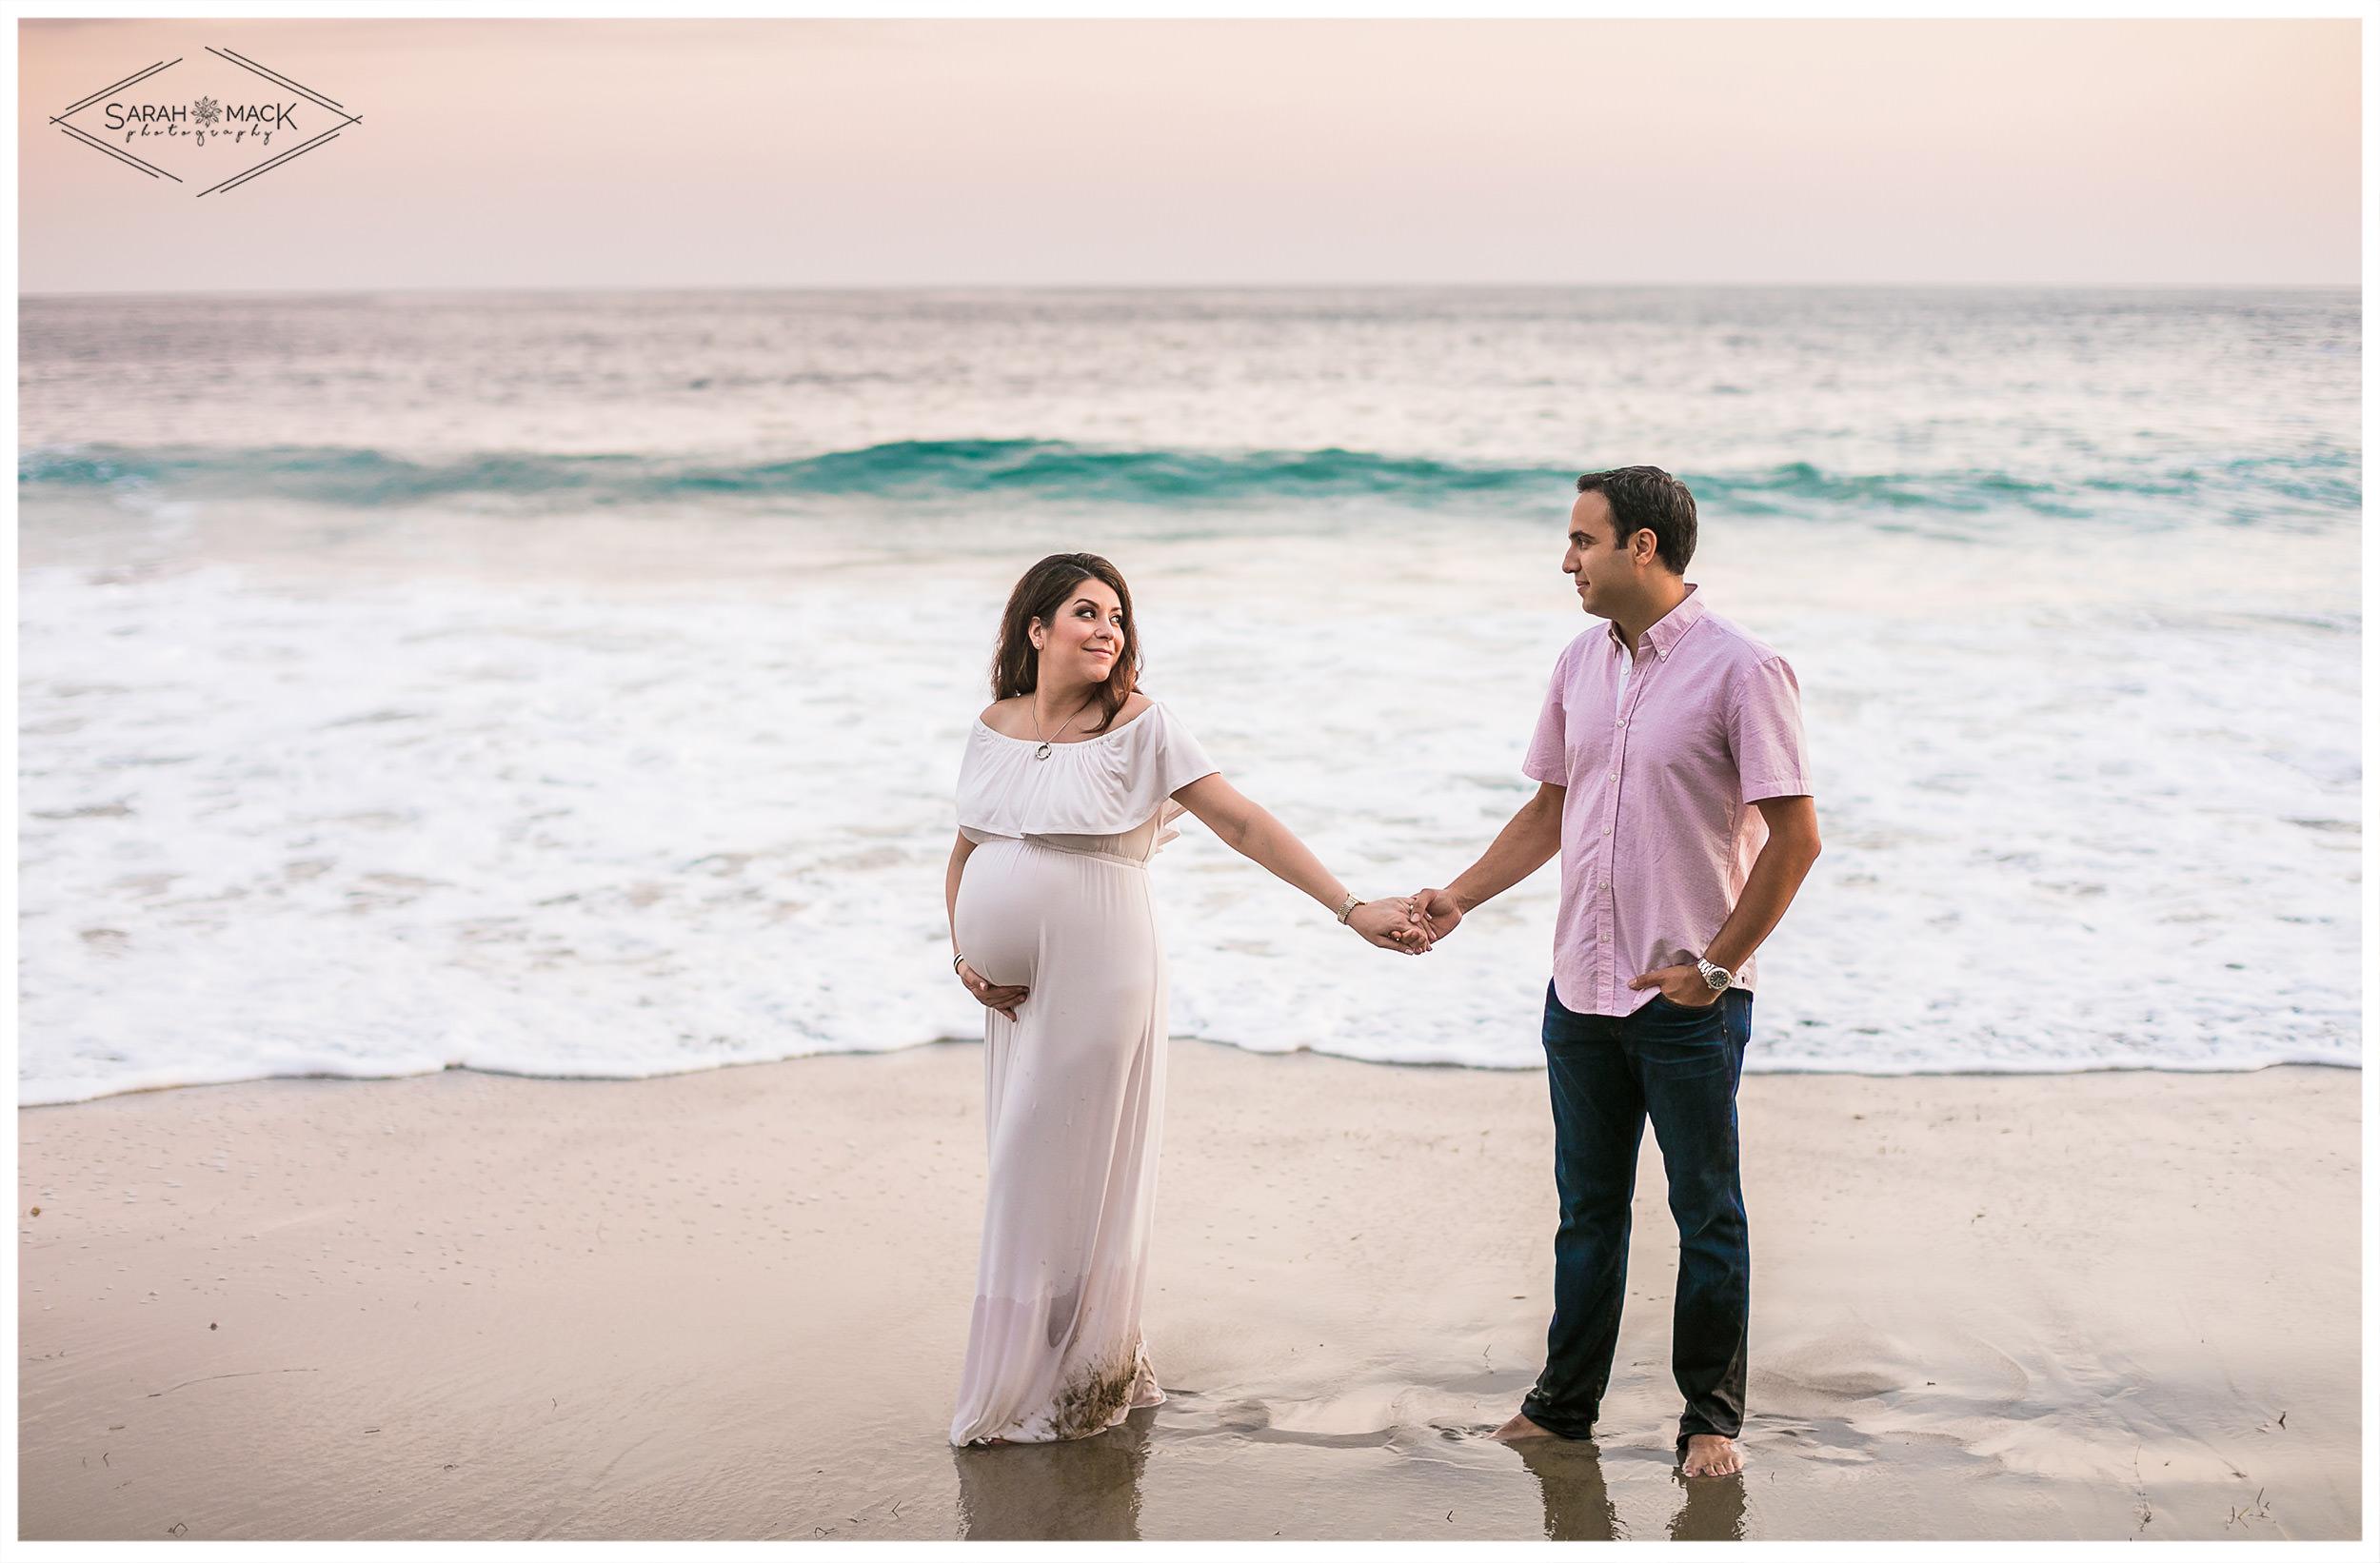 MA-Orange-County-Maternity-Photography-7.jpg